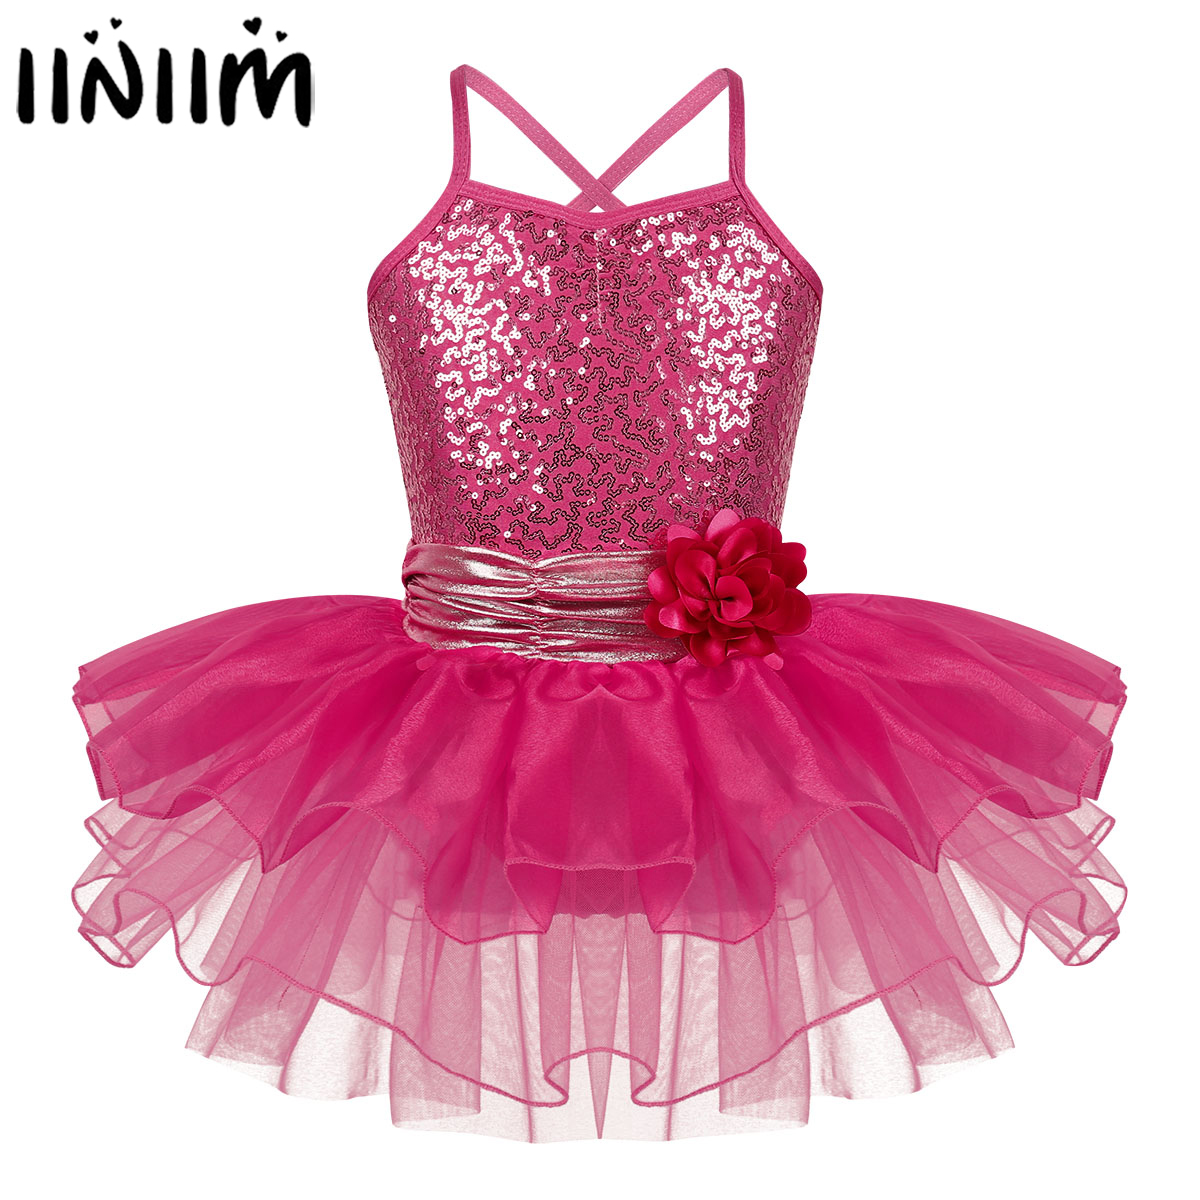 Iiniim Kids Girls Flower Strap Athletic Lyrical Dance Costumes Parties Dancewear Ballerina Ballet Gymnastics Leotard Tutu Dress